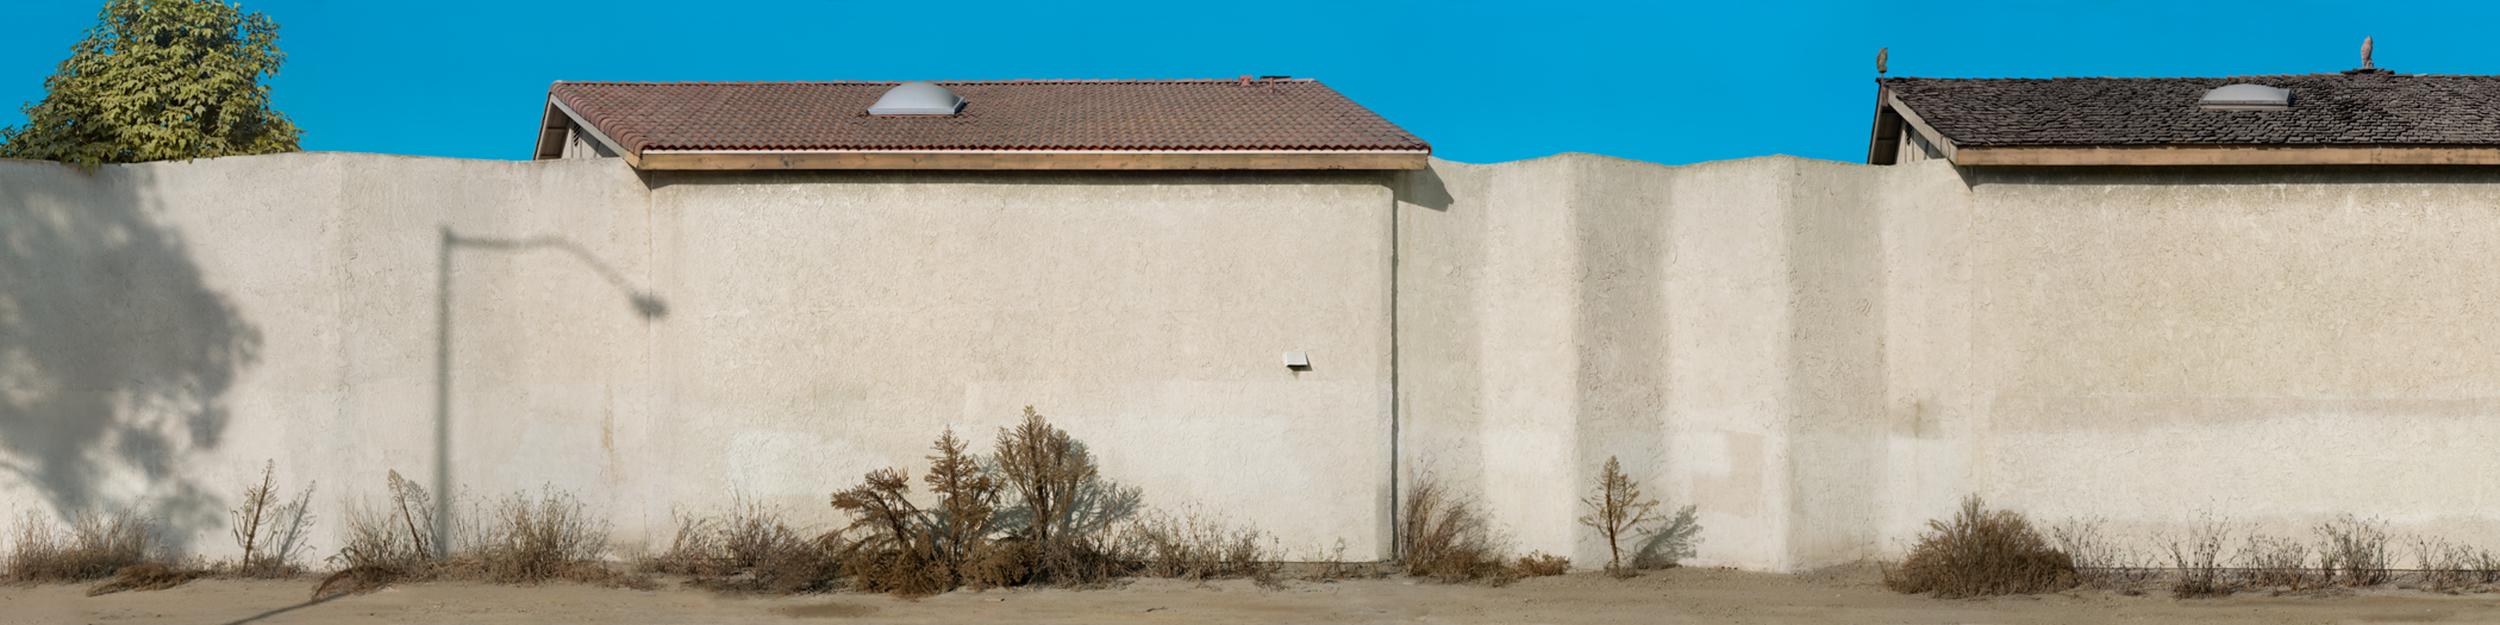 Afriges-20090823-2.jpg